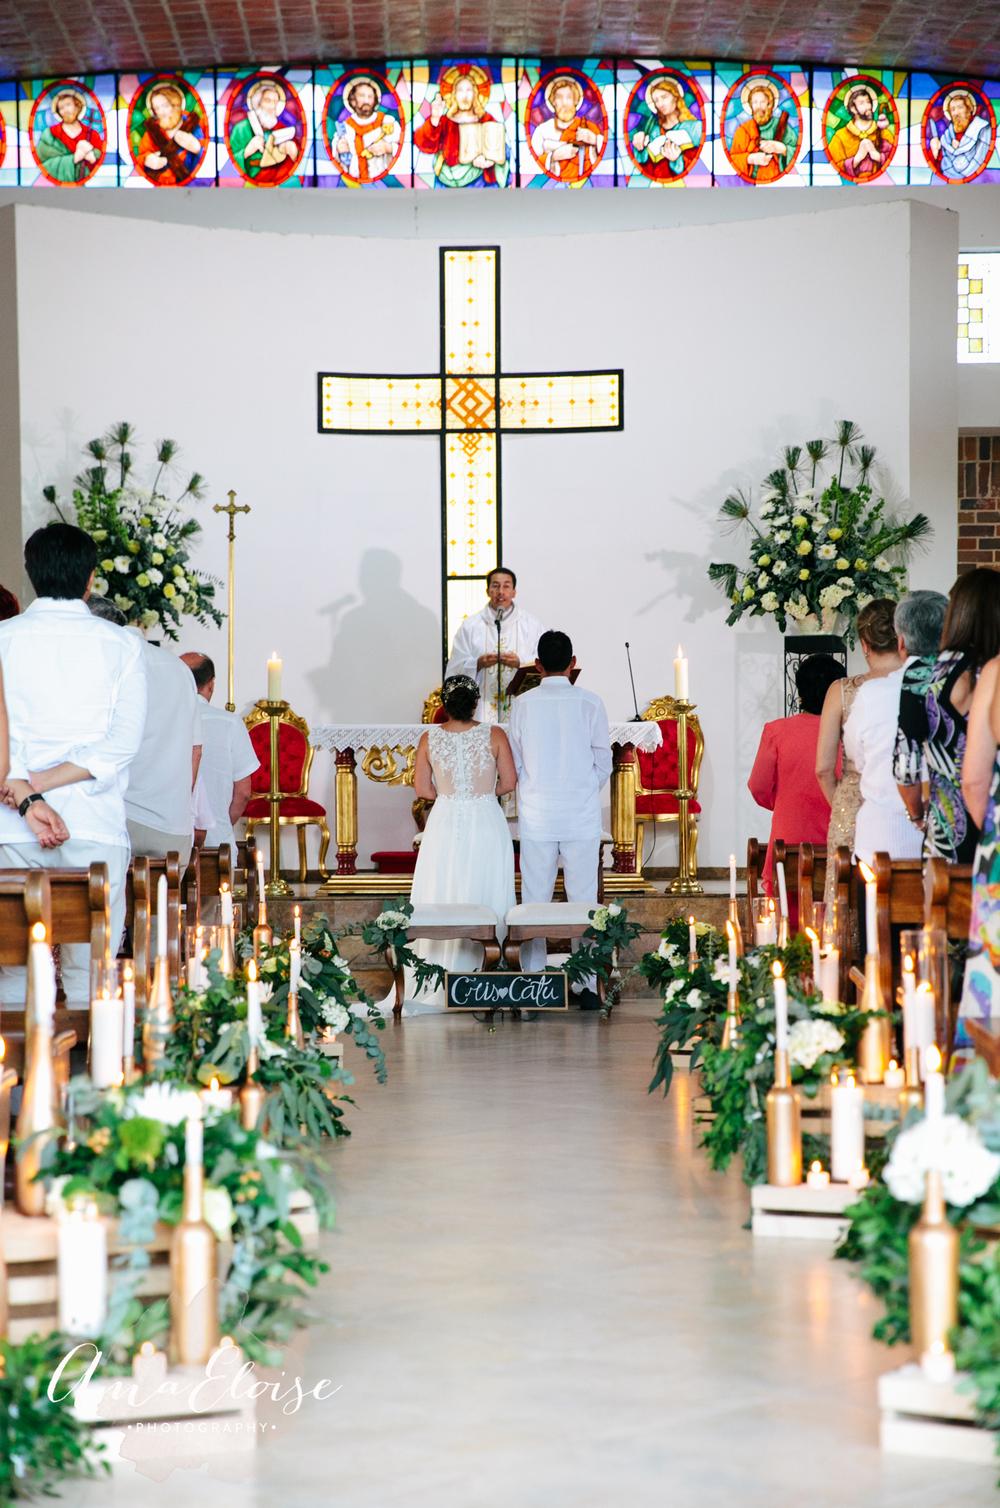 ana eloise photography wedding photography dallas texas